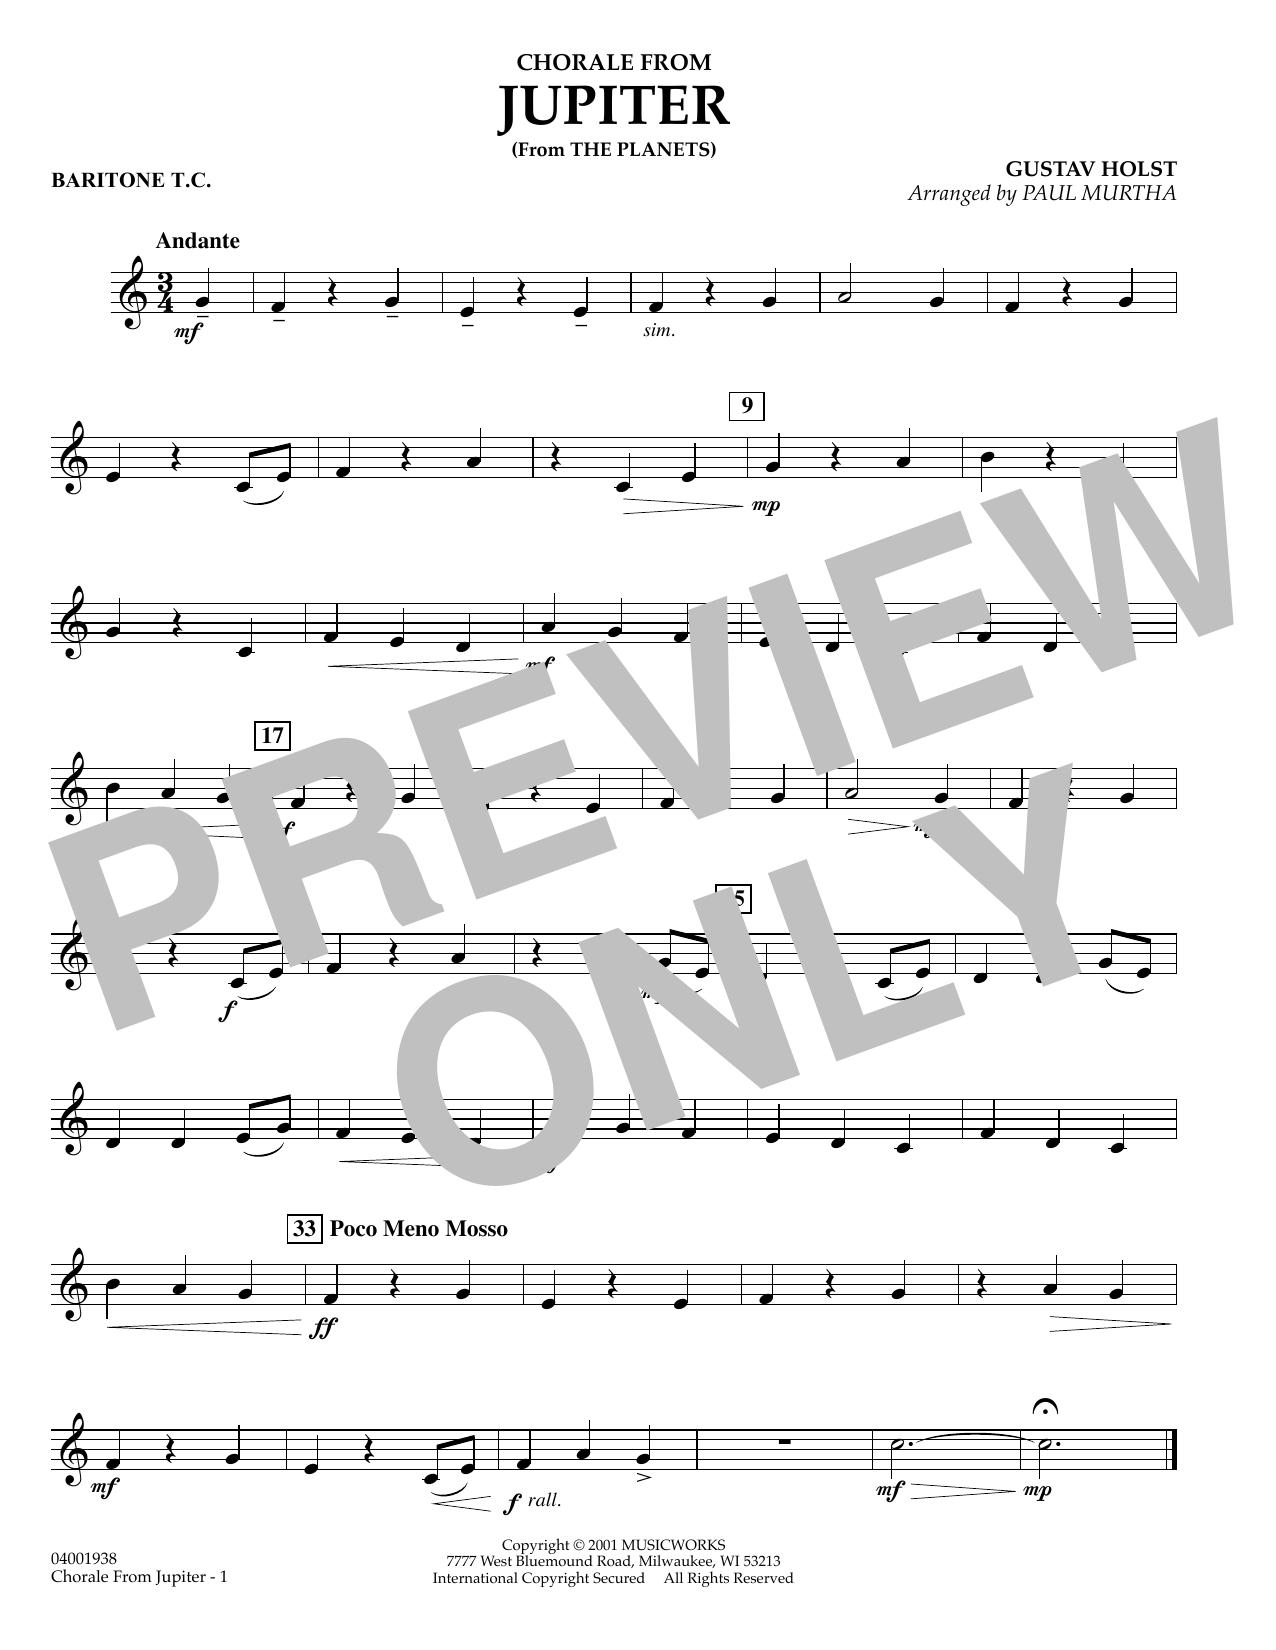 HL_DDS_11446142b08Fi5UDo chorale from jupiter tuba by gustav holst hal leonard prima music